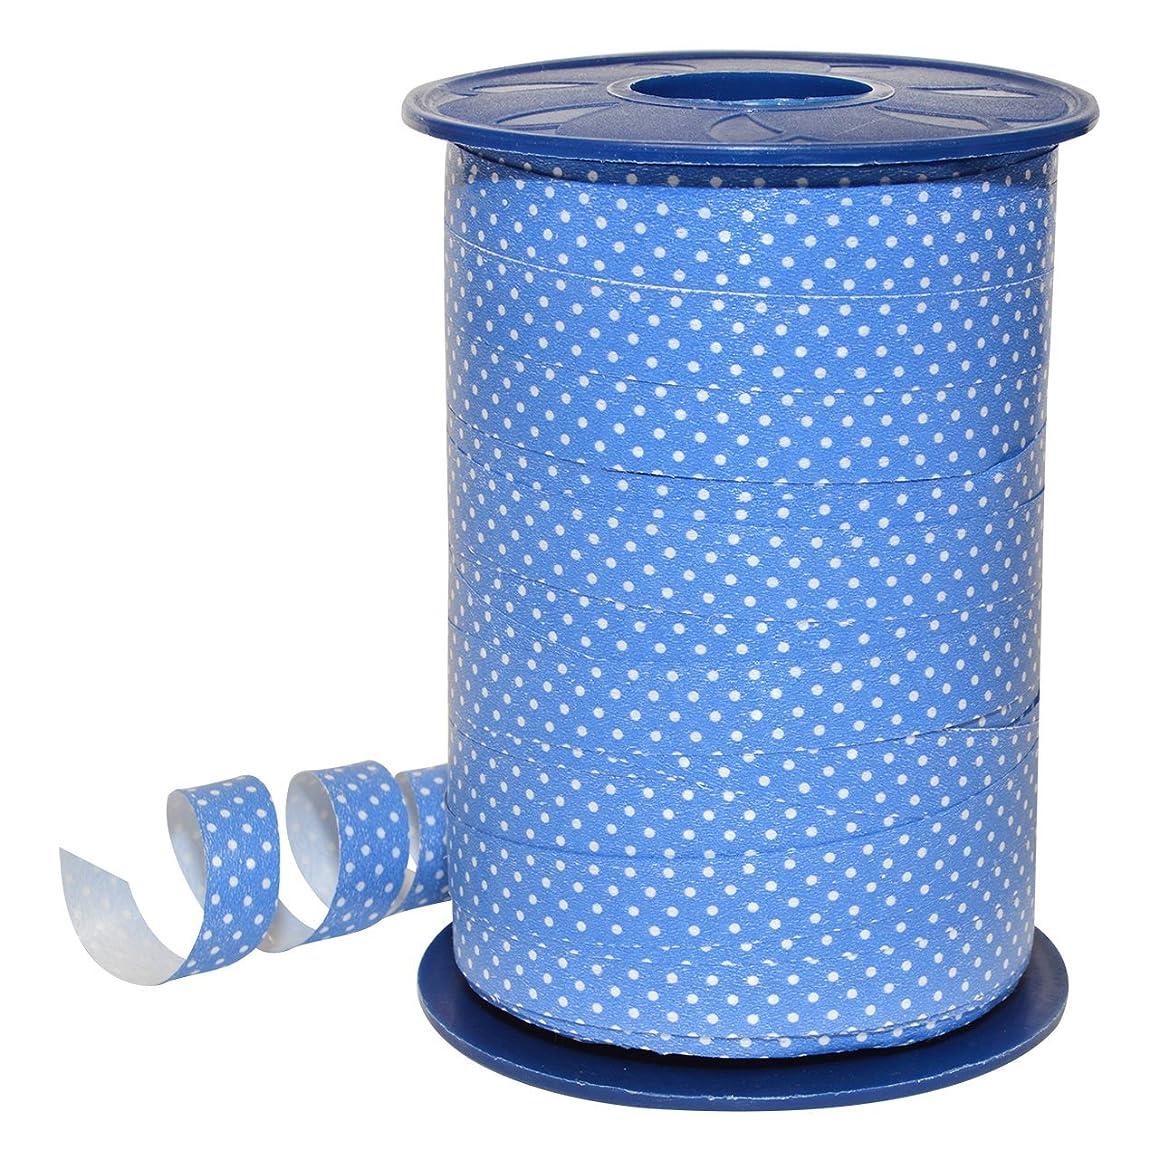 Morex Ribbon 378/9-612 Polypropylene Dots Curling Ribbon, 3/8